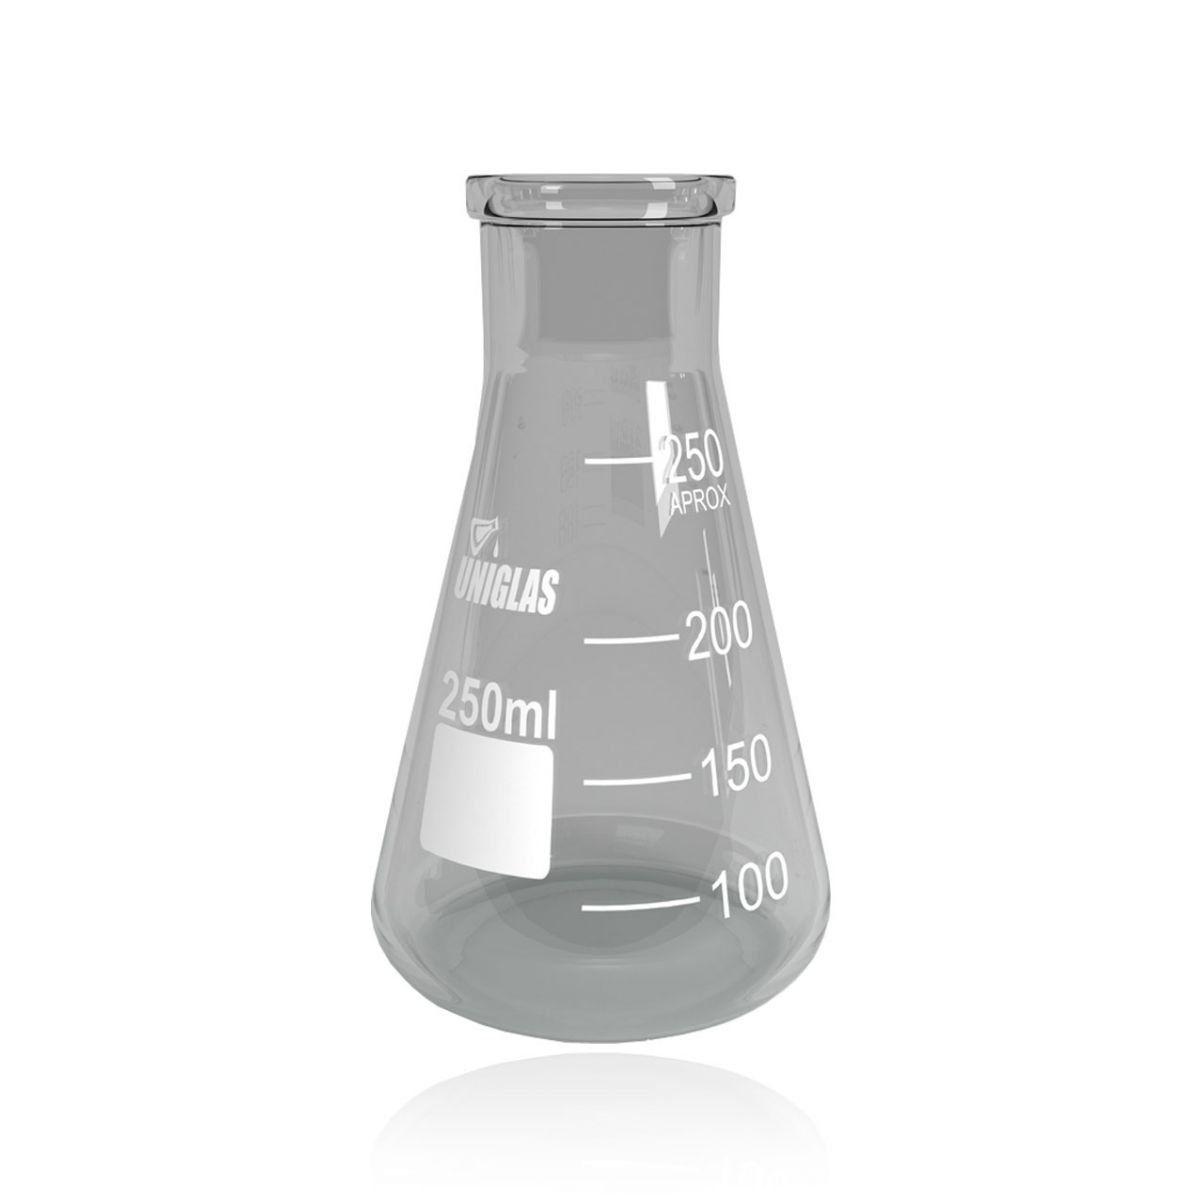 Frasco Erlenmeyer Boca Larga capacidade 500 ml - 8 und./ cx. Uniglas